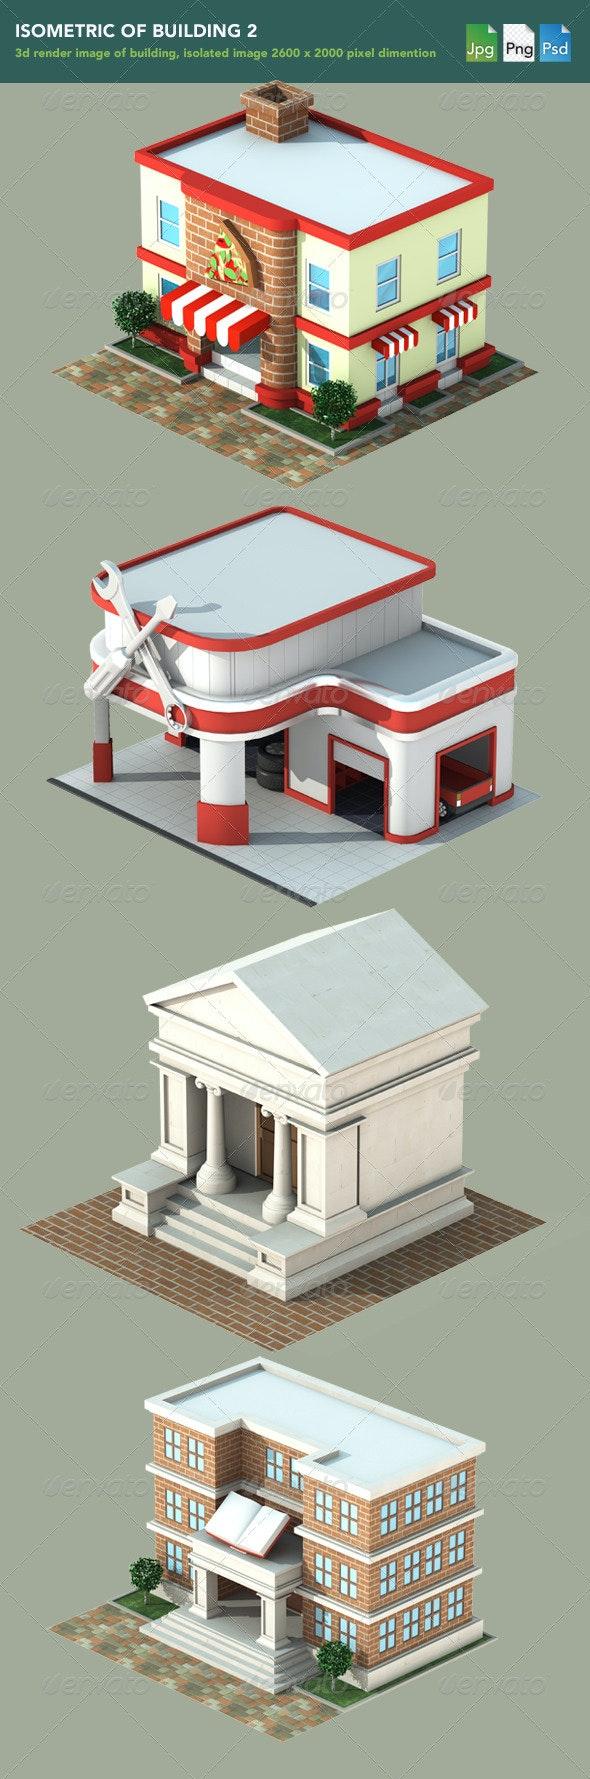 Isometric 3D Render of Building 2 - 3D Renders Graphics